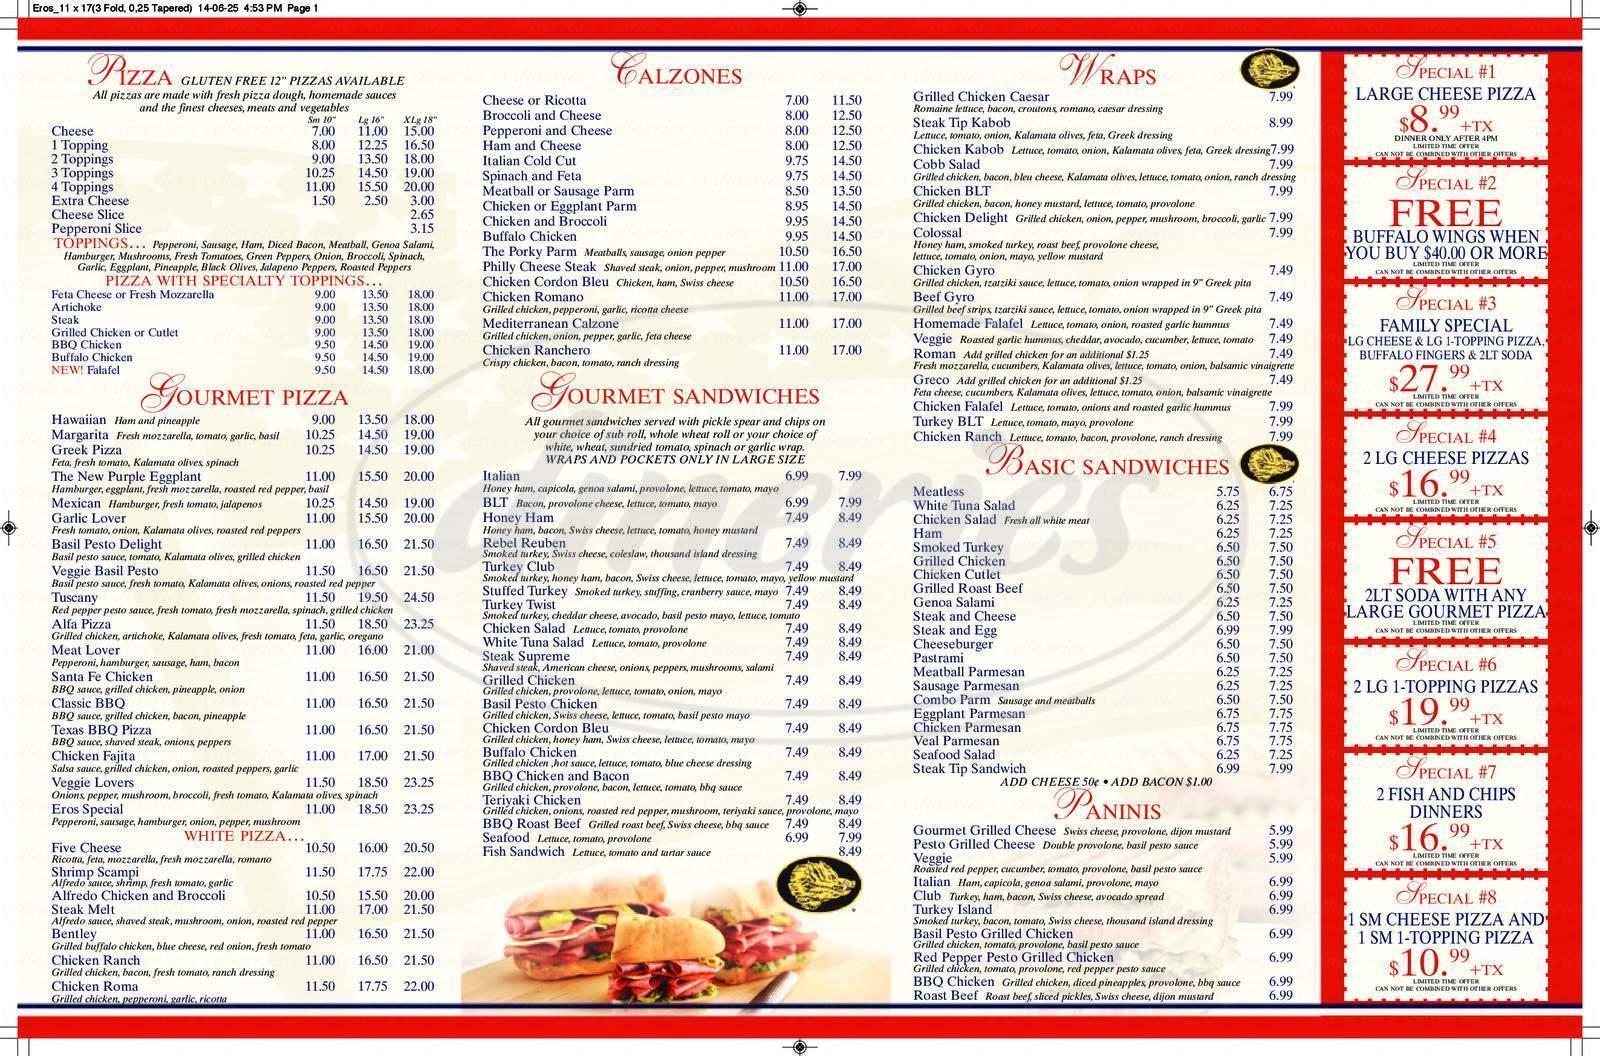 menu for Eros Gourmet Pizza & Deli